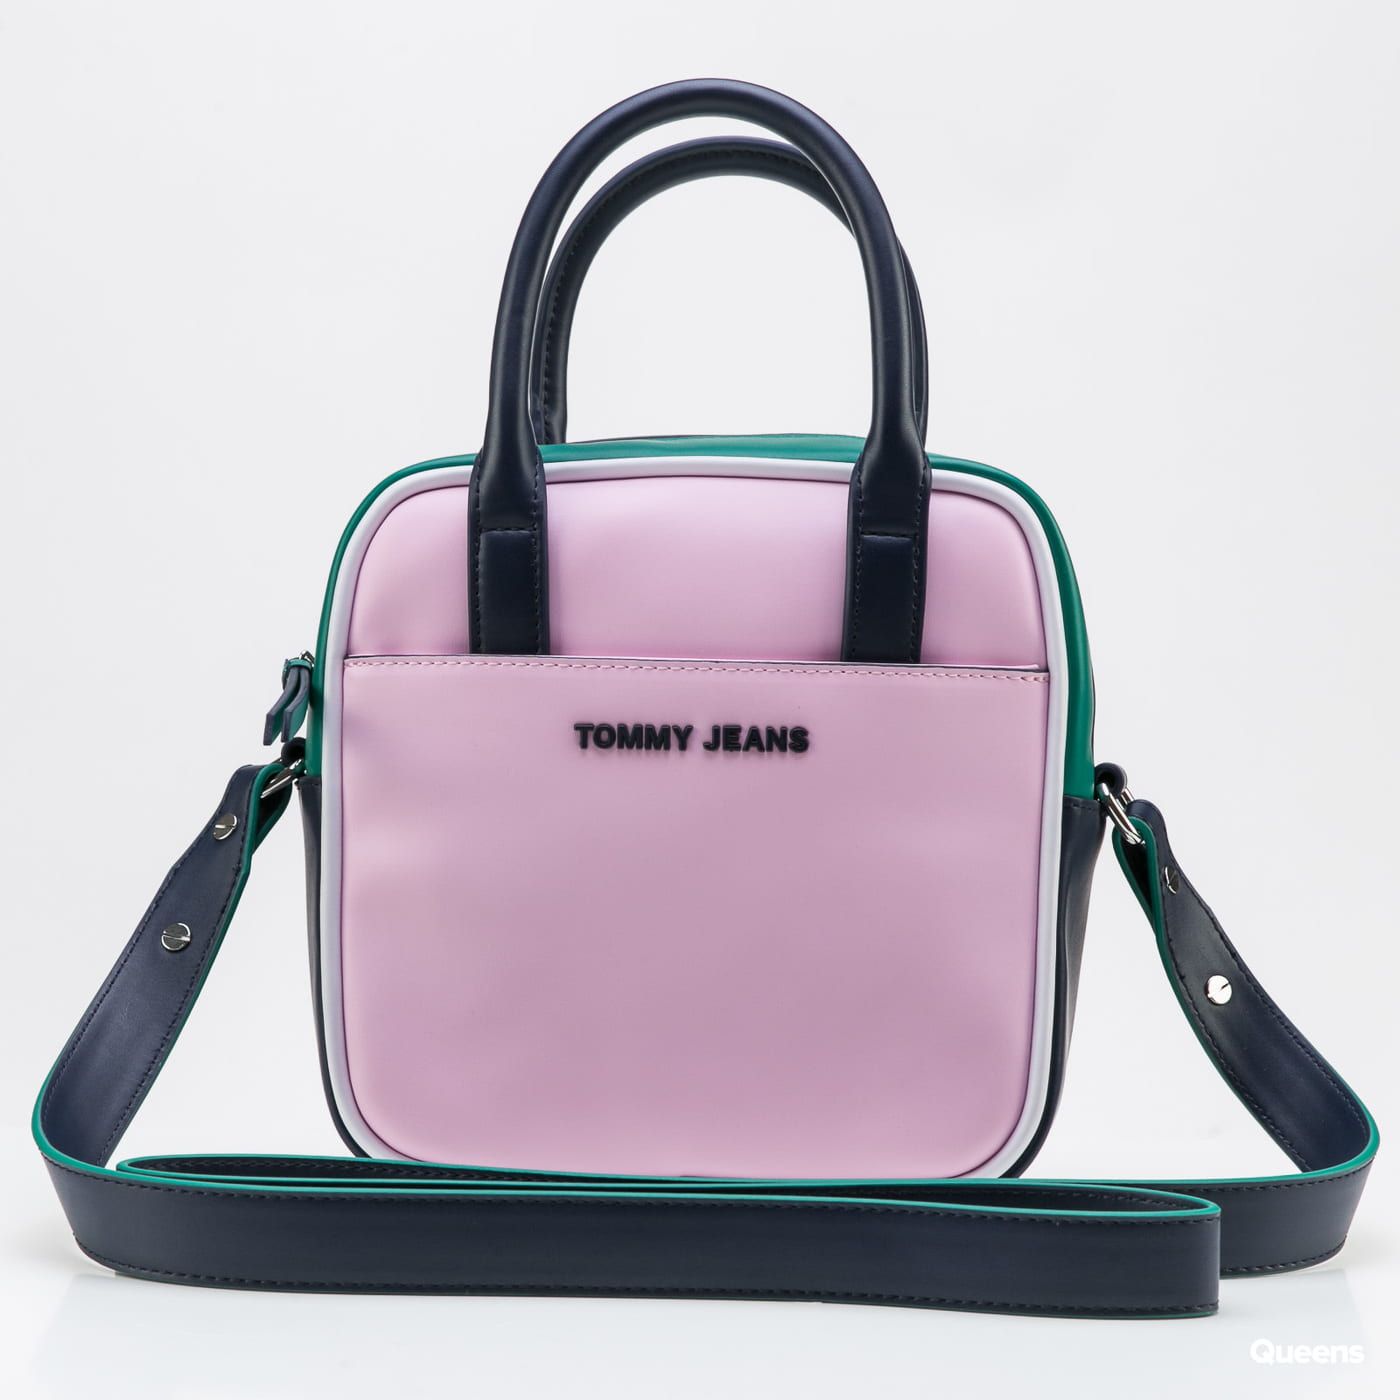 TOMMY JEANS Femme PU Satchel light pink / green